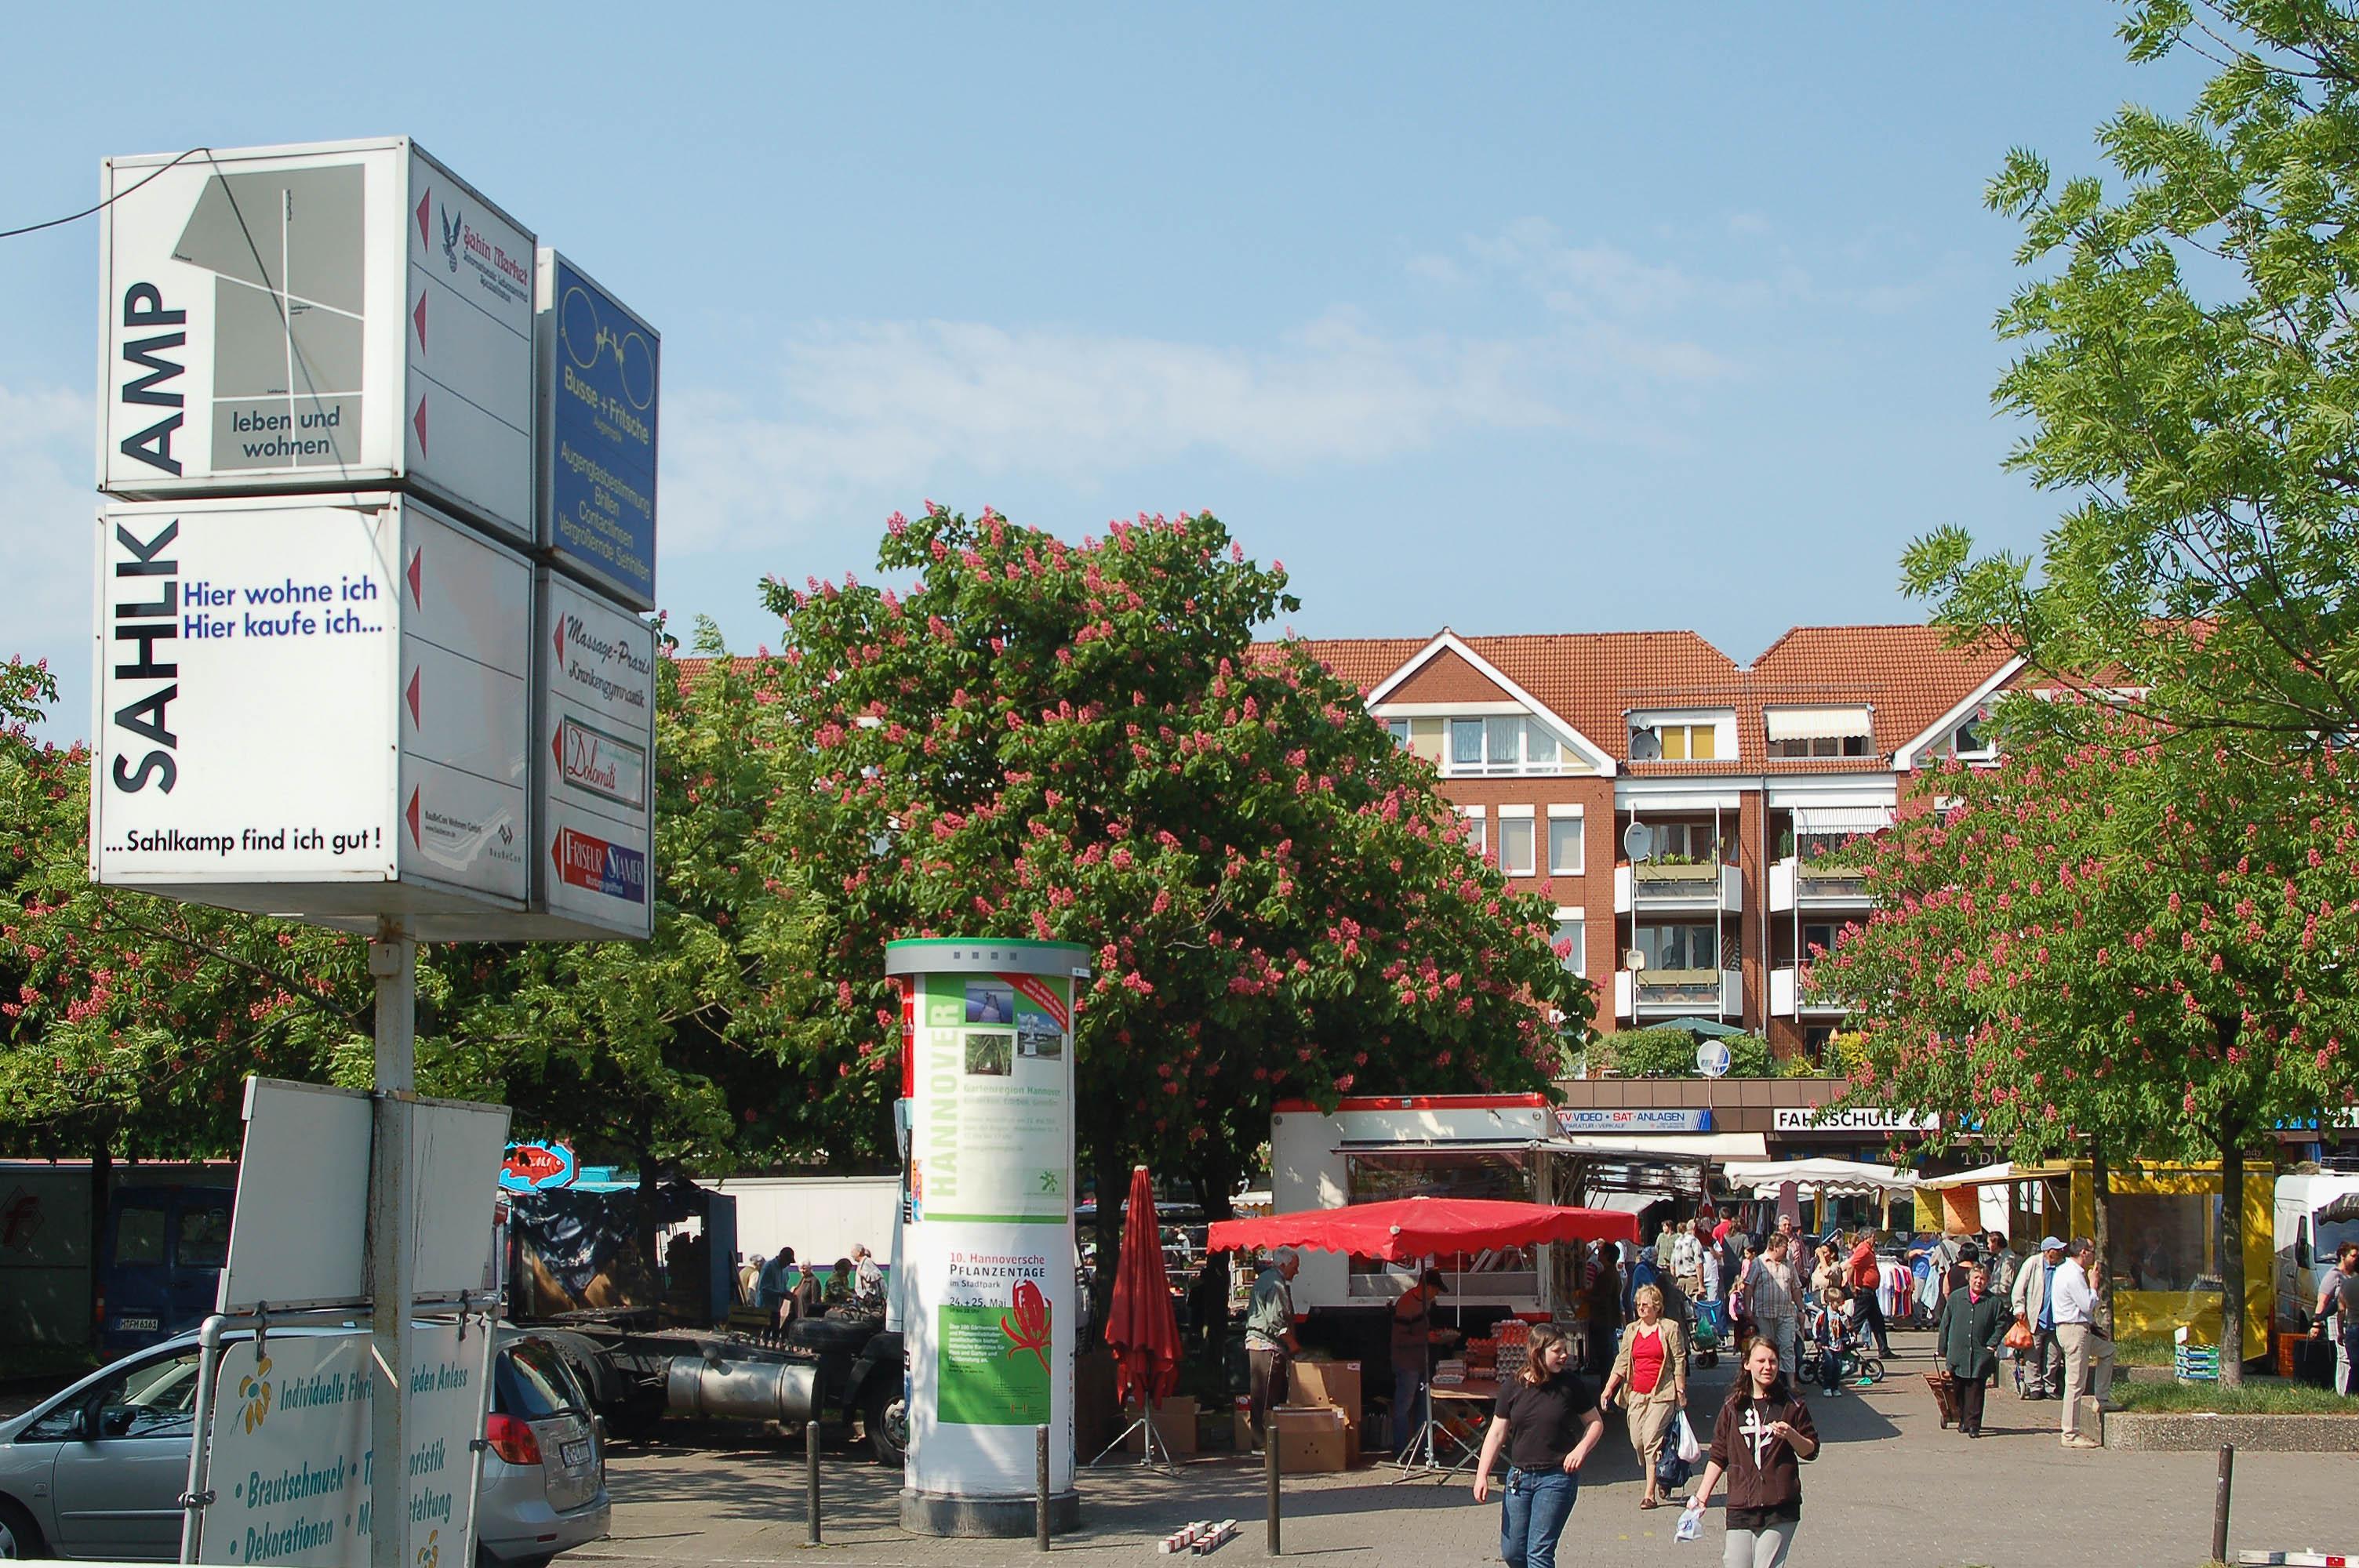 Blick auf den Sahlkampmarkt